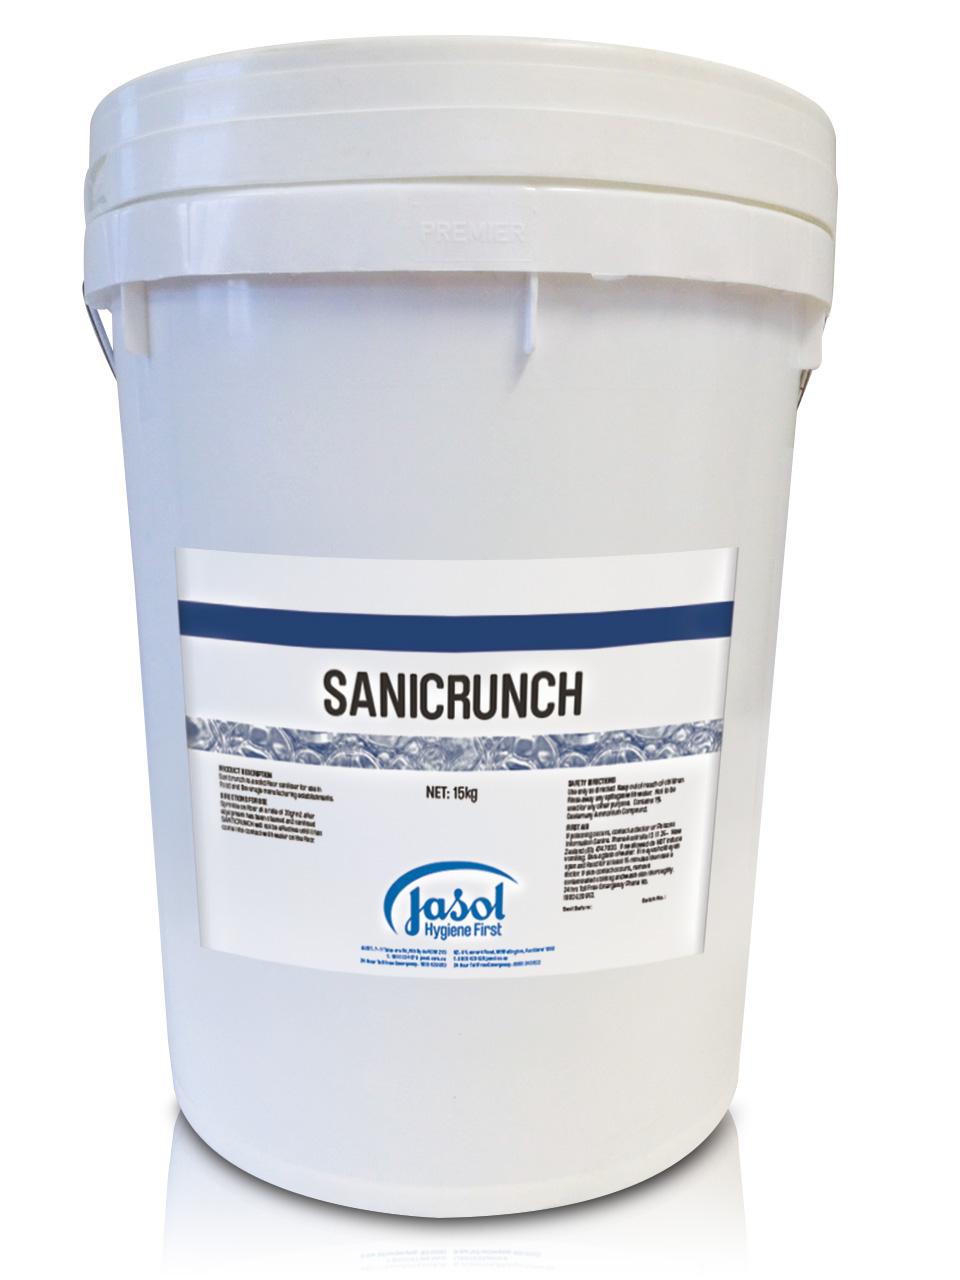 ULTIMATE-Sanicrunch